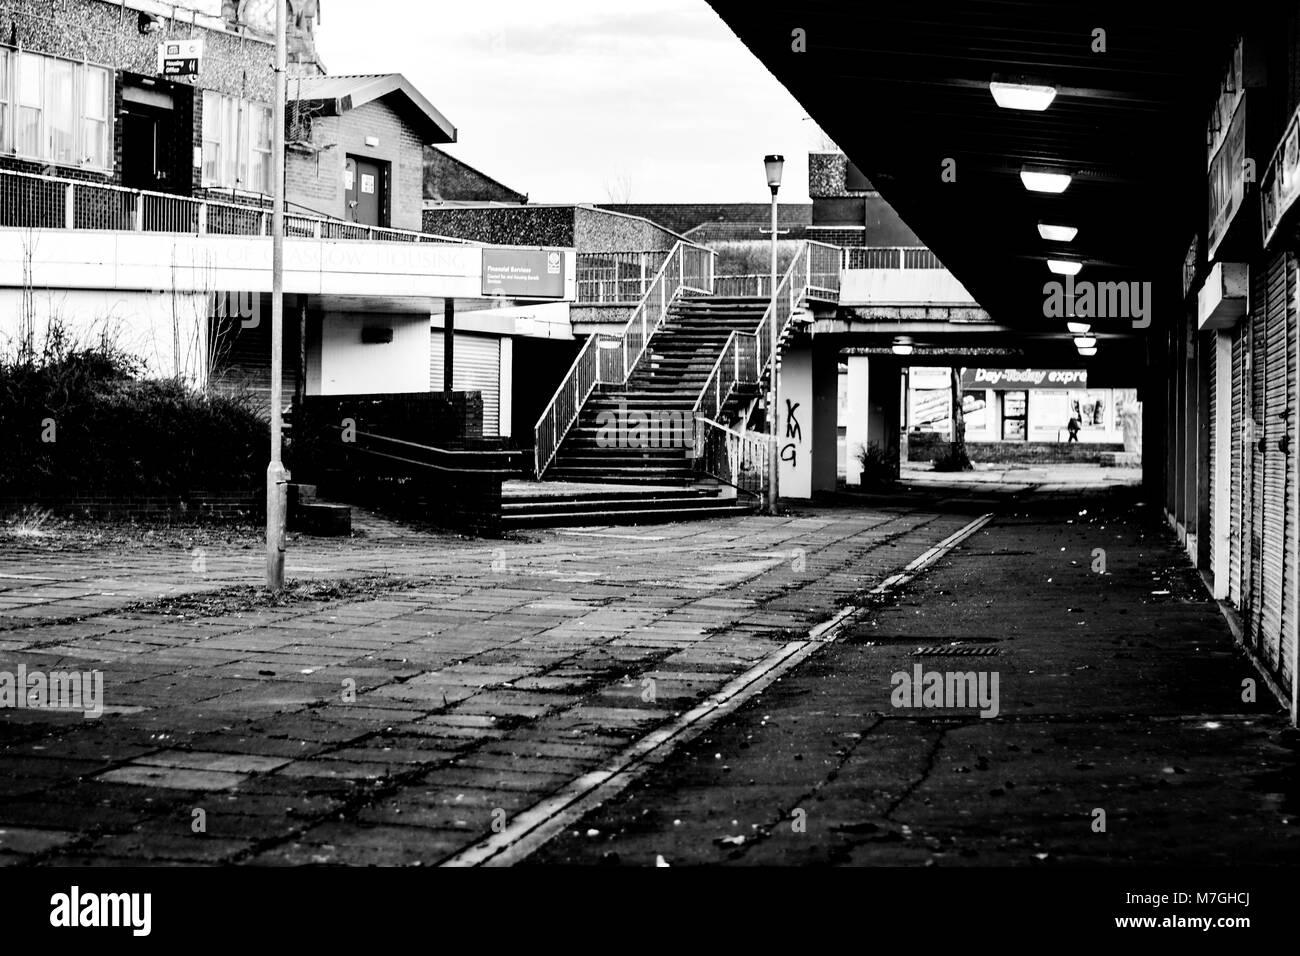 Pollokshaws Arcade in southside of Glasgow - Stock Image